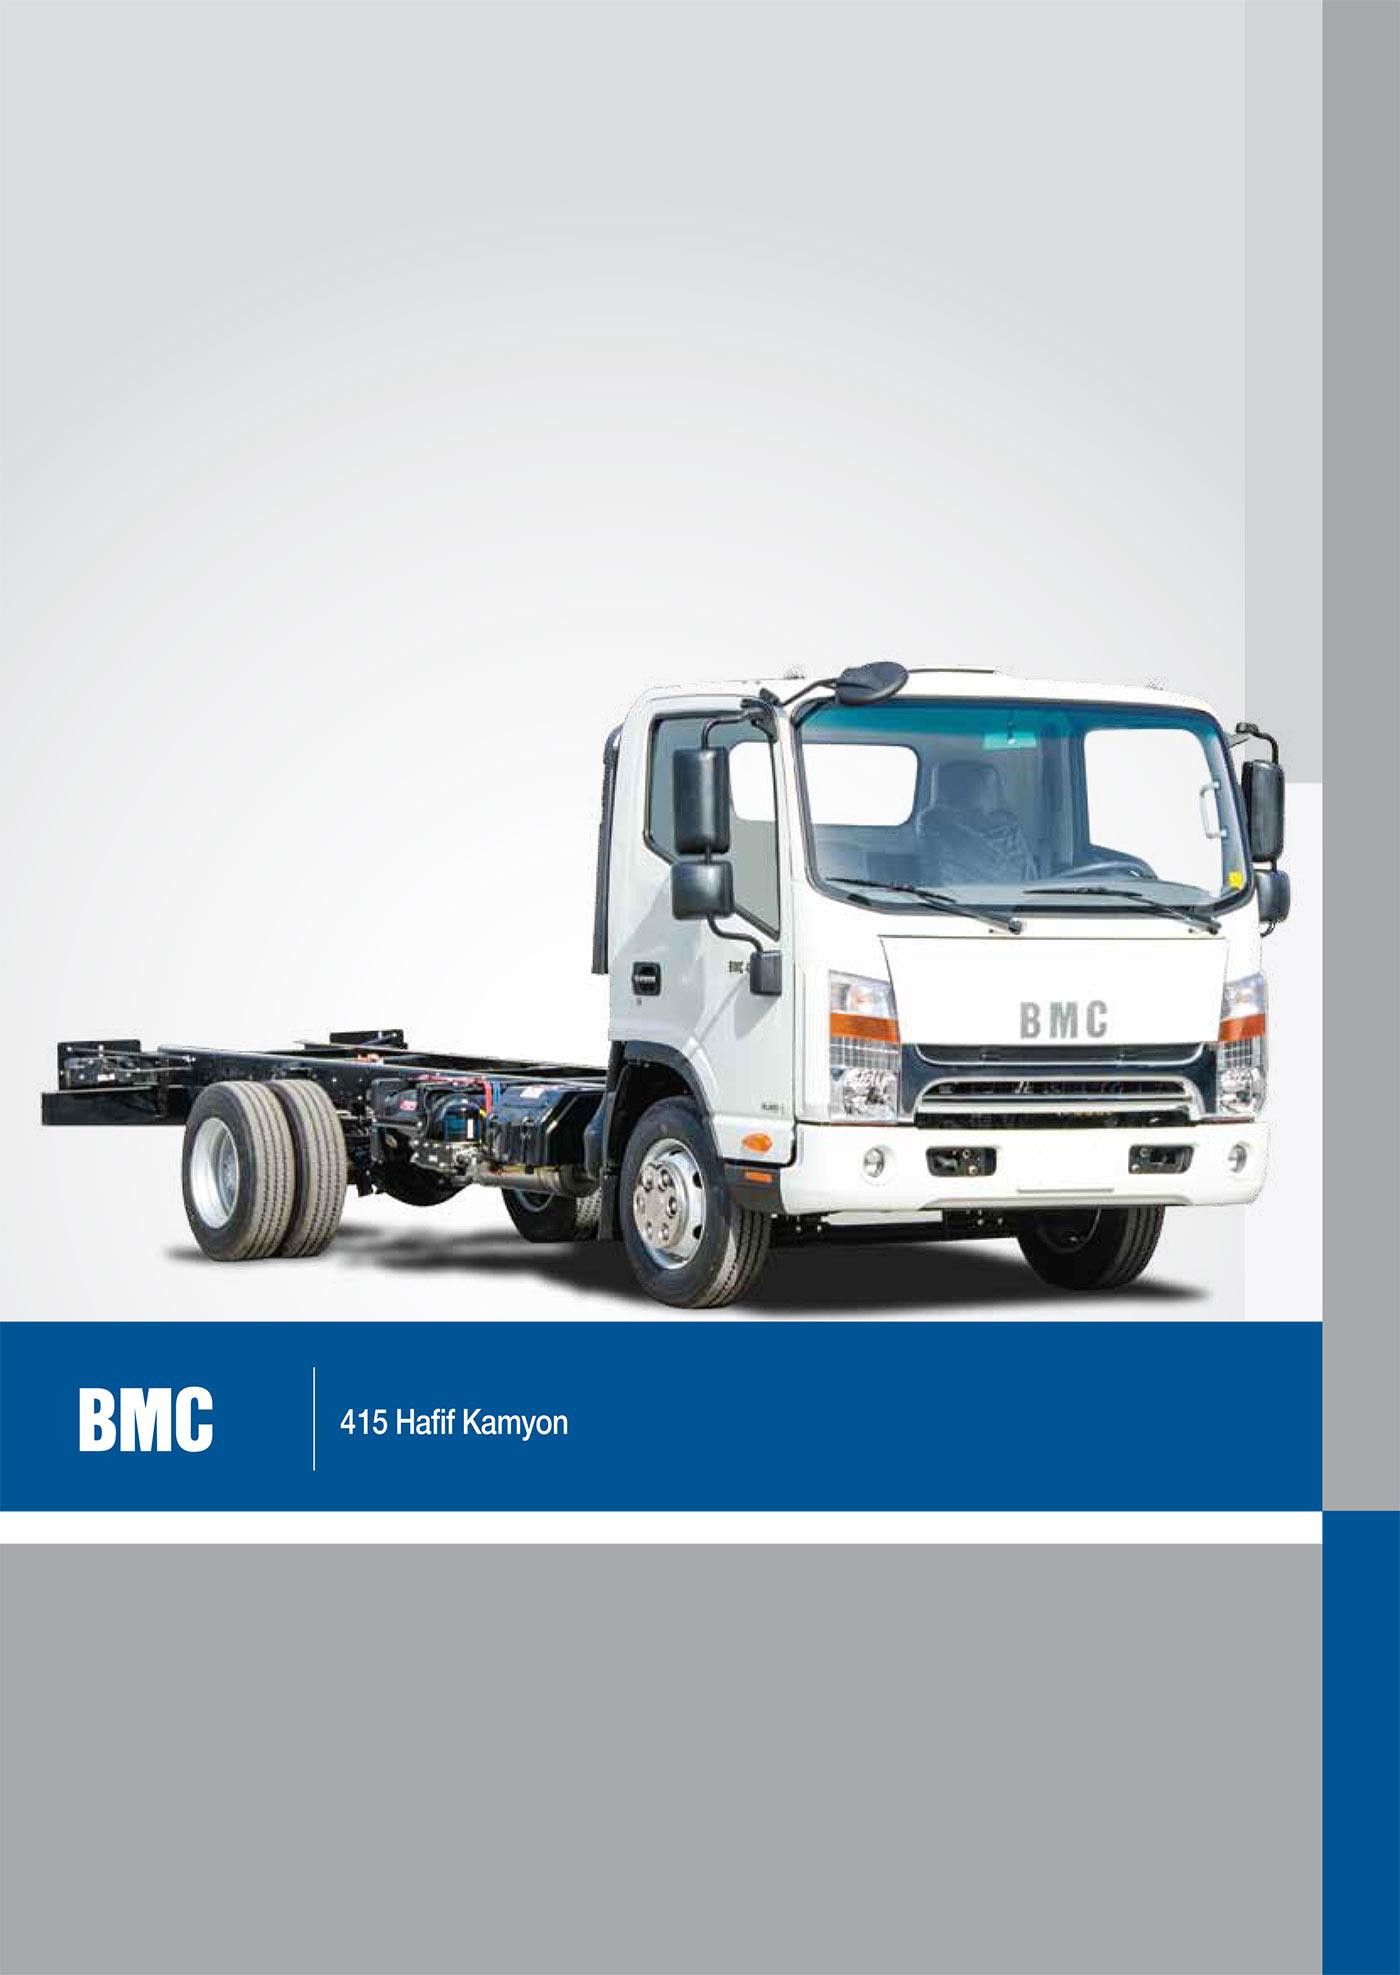 bmc-415-brosur-1